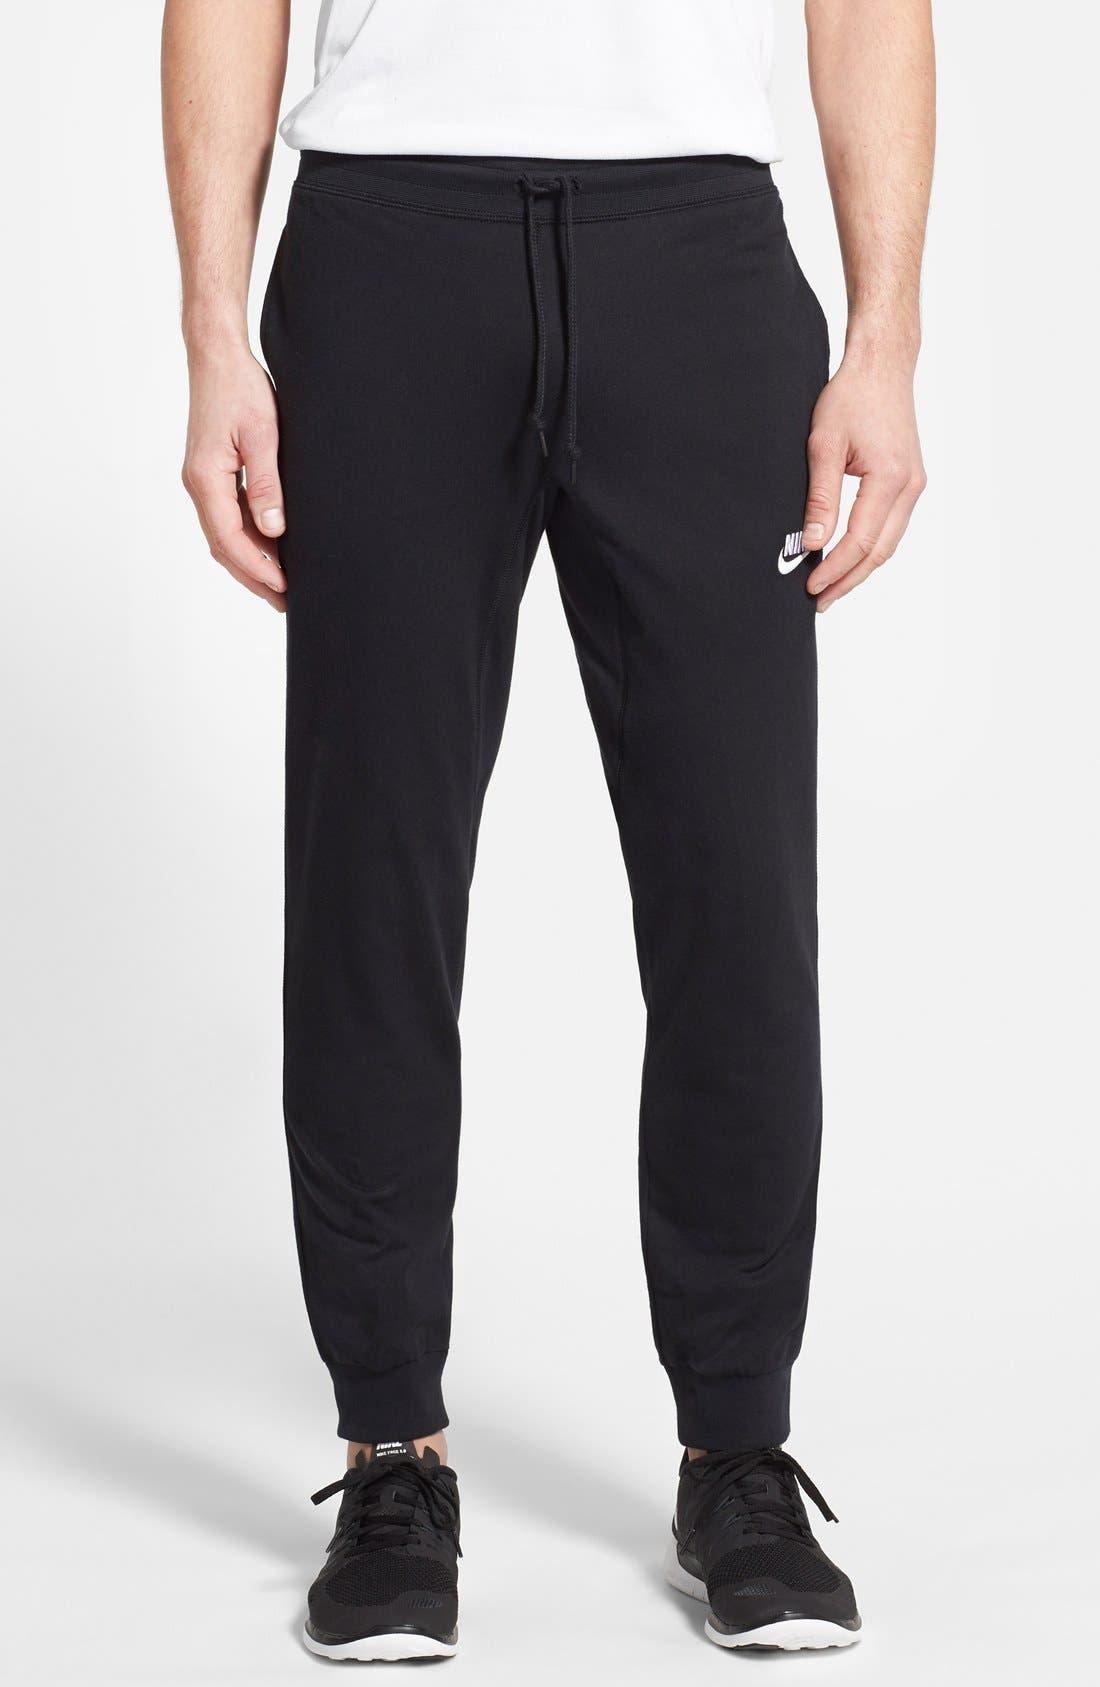 Main Image - Nike 'AW77' Cuffed Fleece Sweatpants